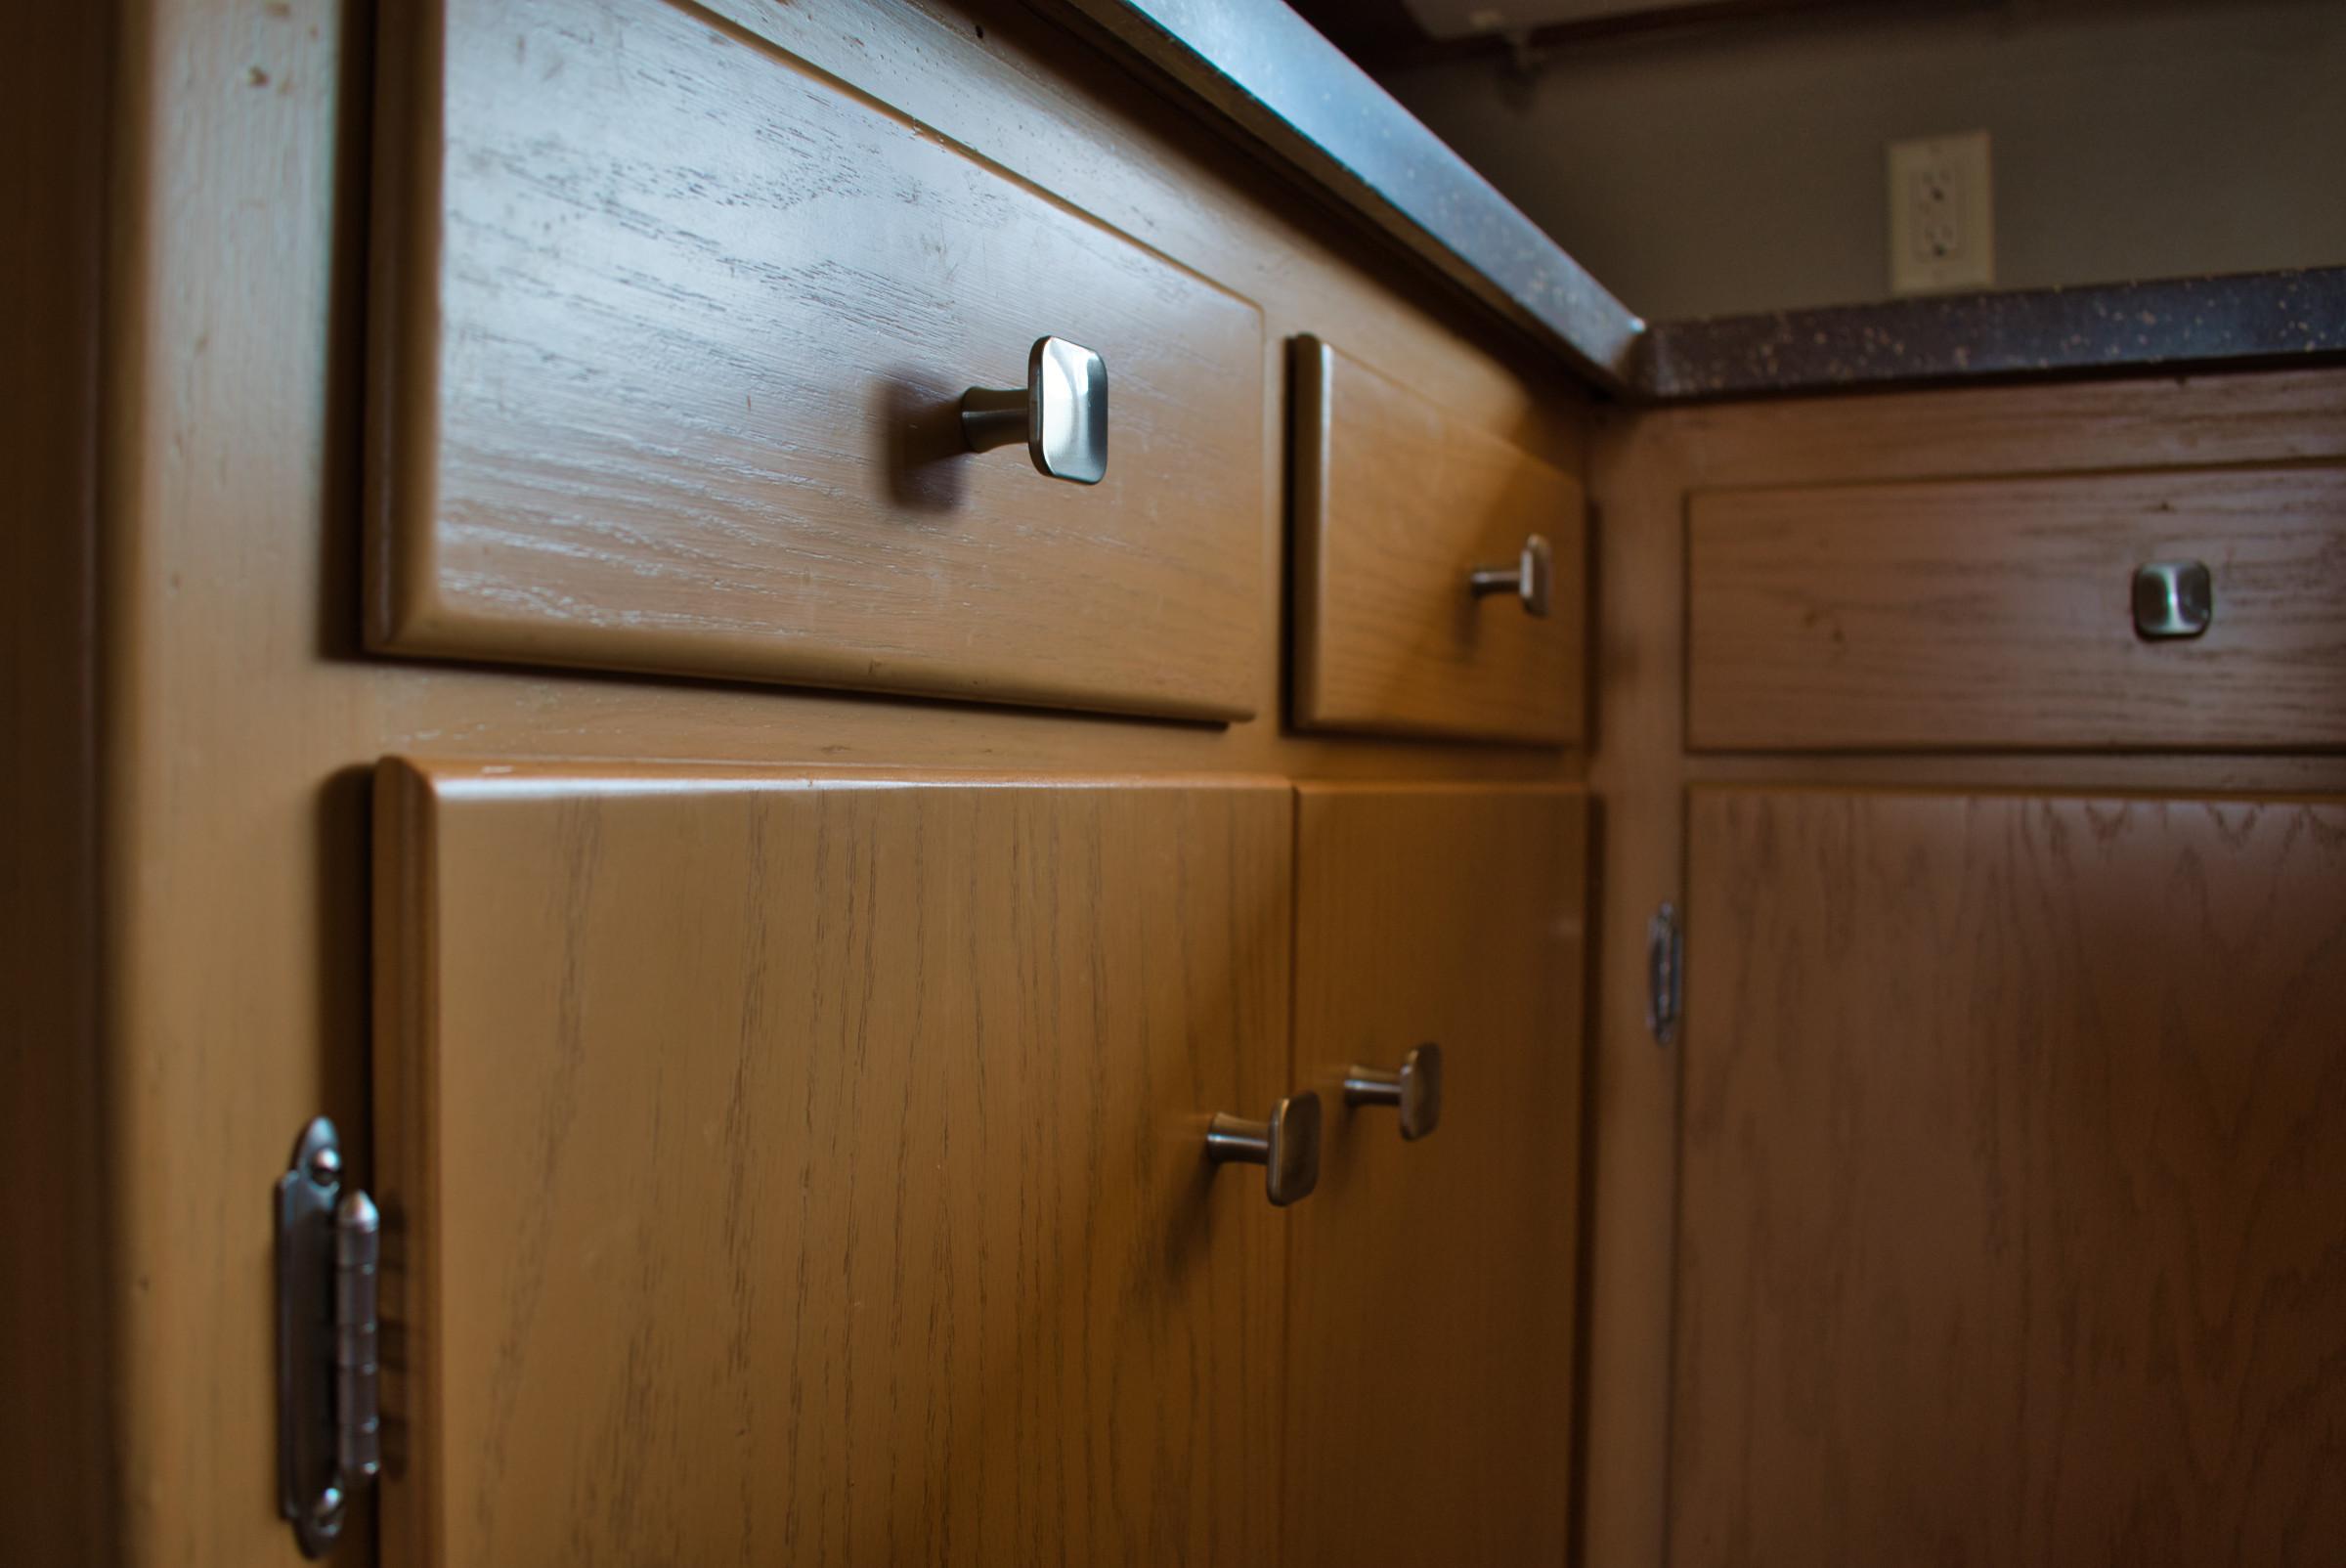 Queens Way Kitchen Remodel - Cabinet Hardware